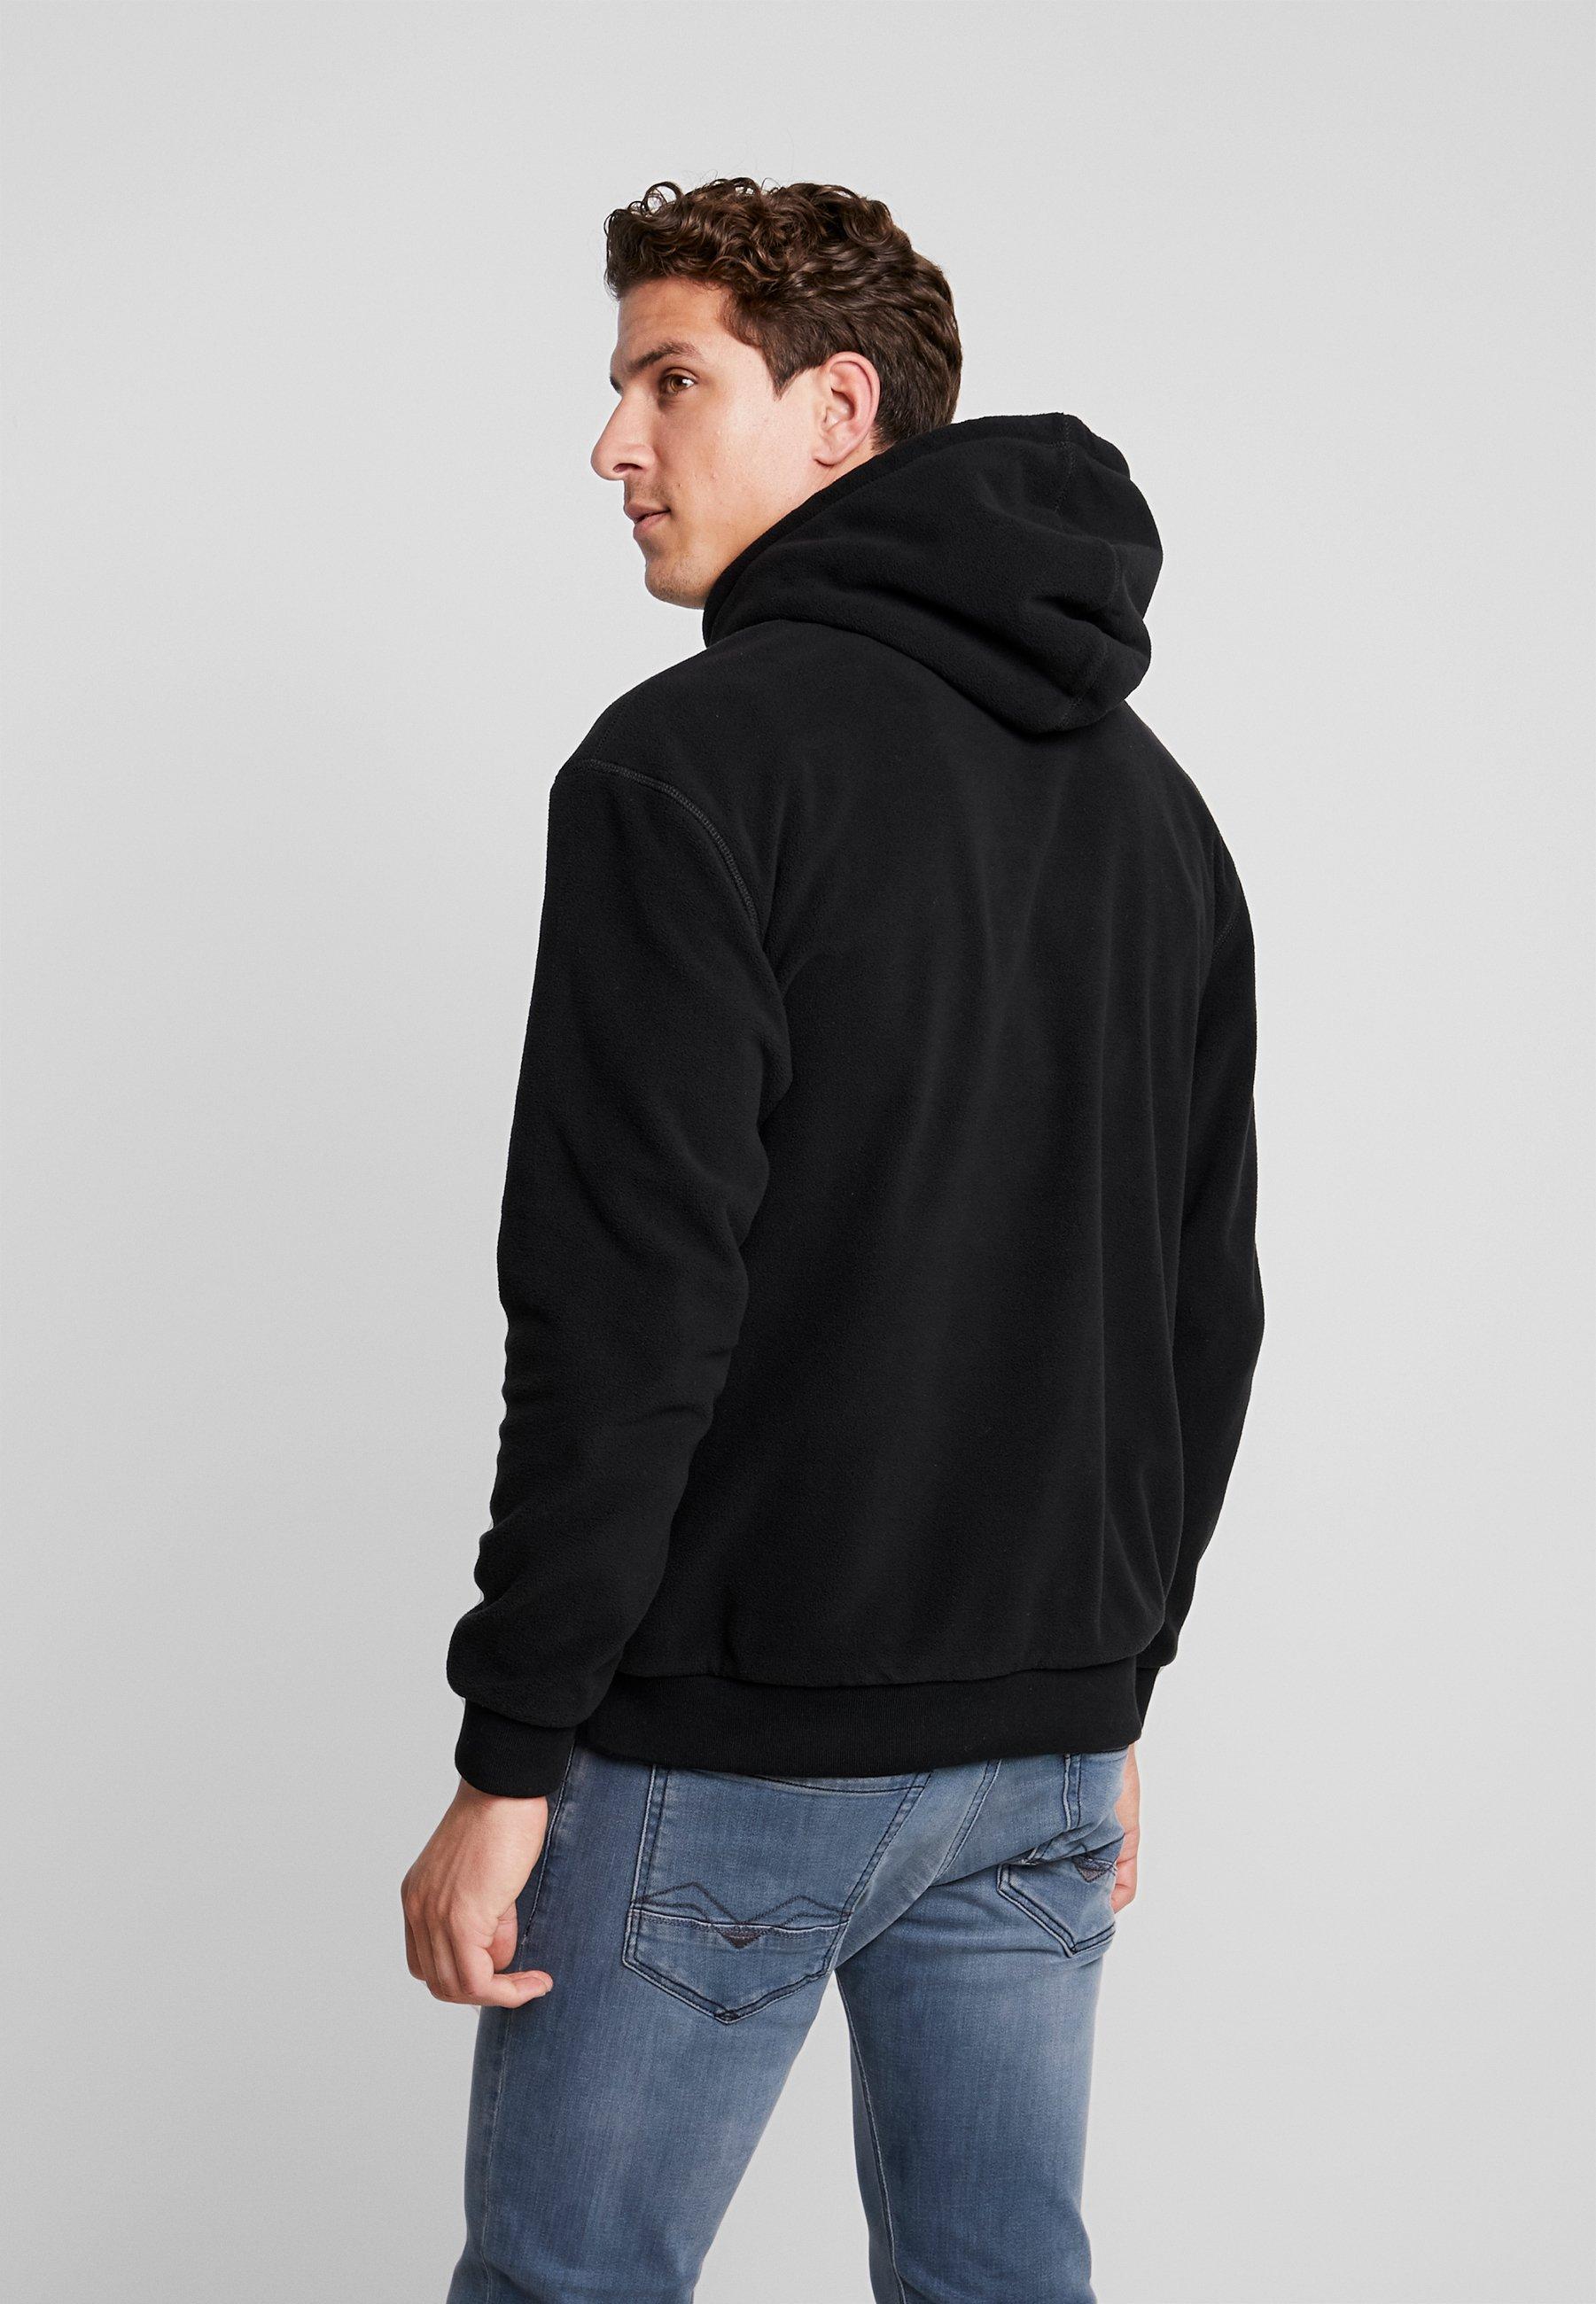 Best Selling Get Men's Clothing Schott BILLY Hoodie black 9aUTVW1fp ugzQF7Uoi